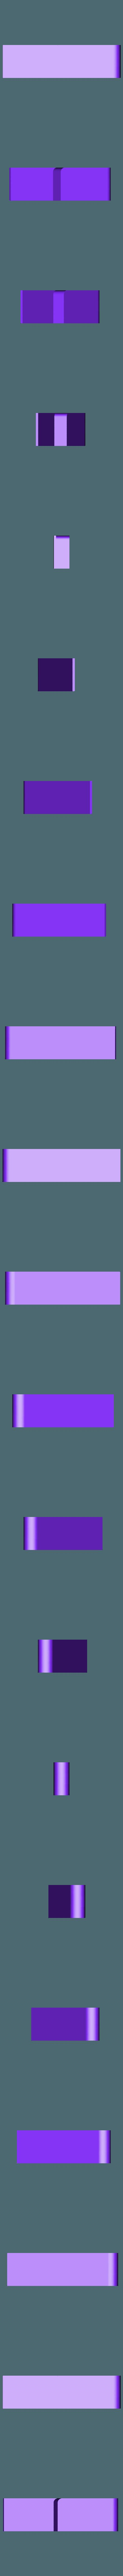 Raspberry_pi_Camera_Mount1.stl Download free STL file Raspberry Pi Camera Mount(V1.3) • Model to 3D print, necobut